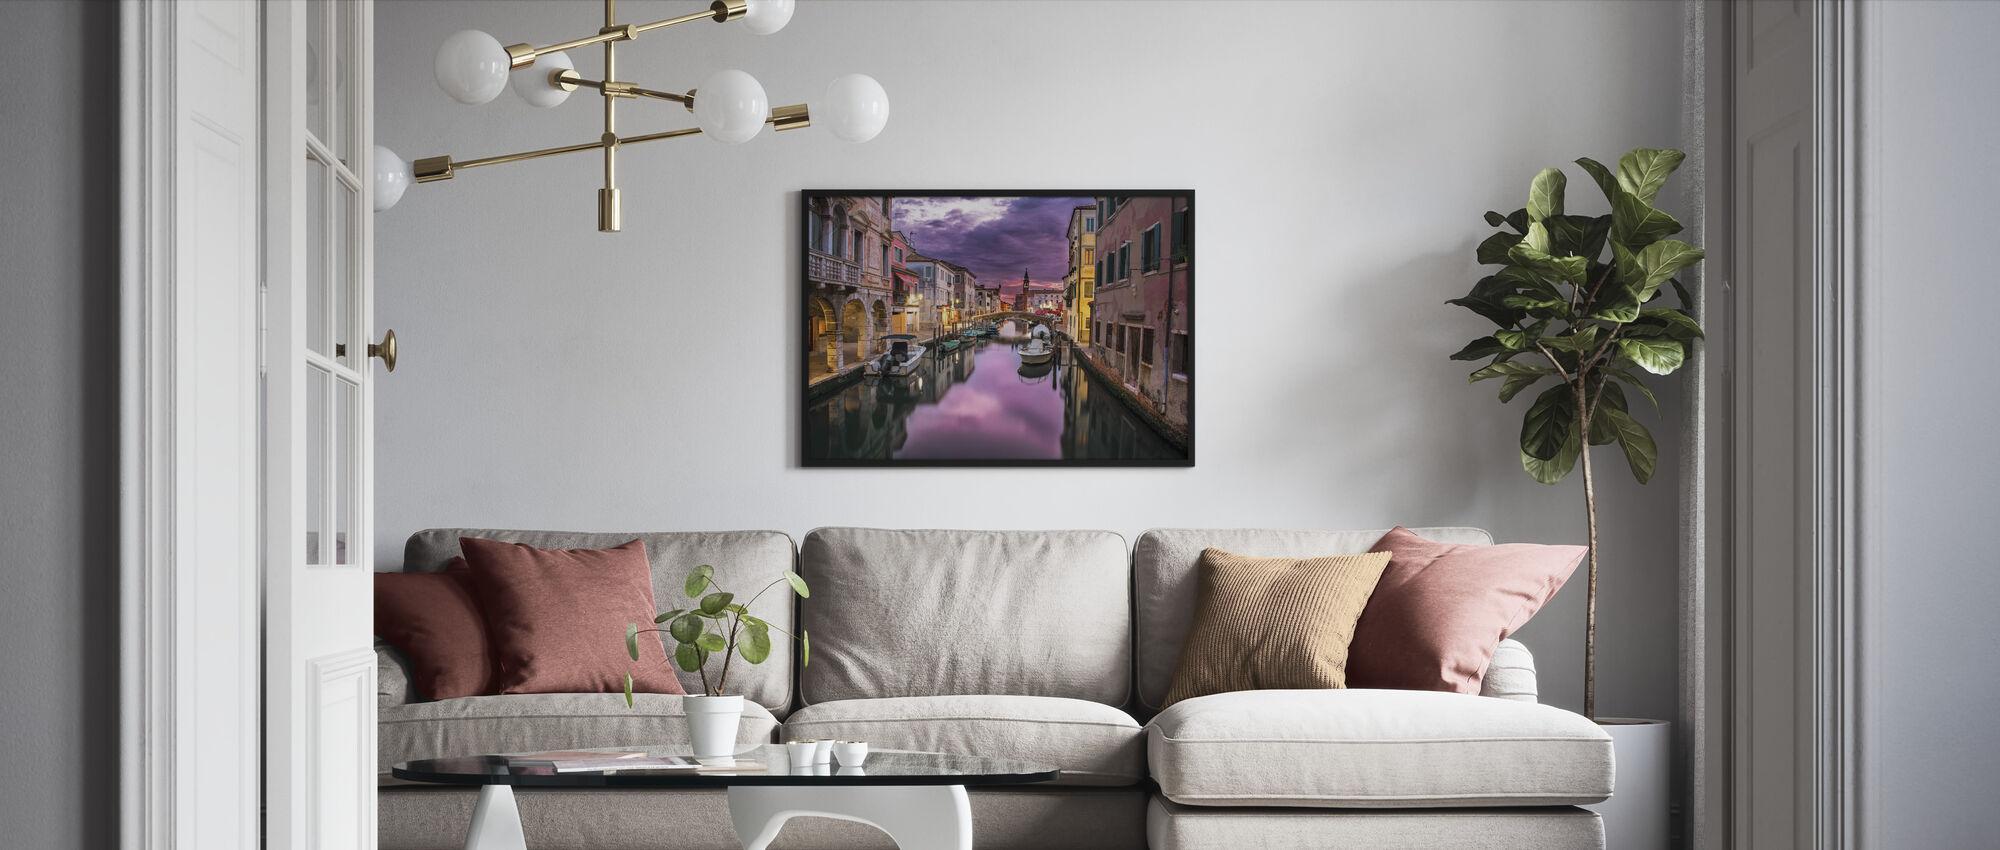 Kanal i Venedig - Inramad tavla - Vardagsrum